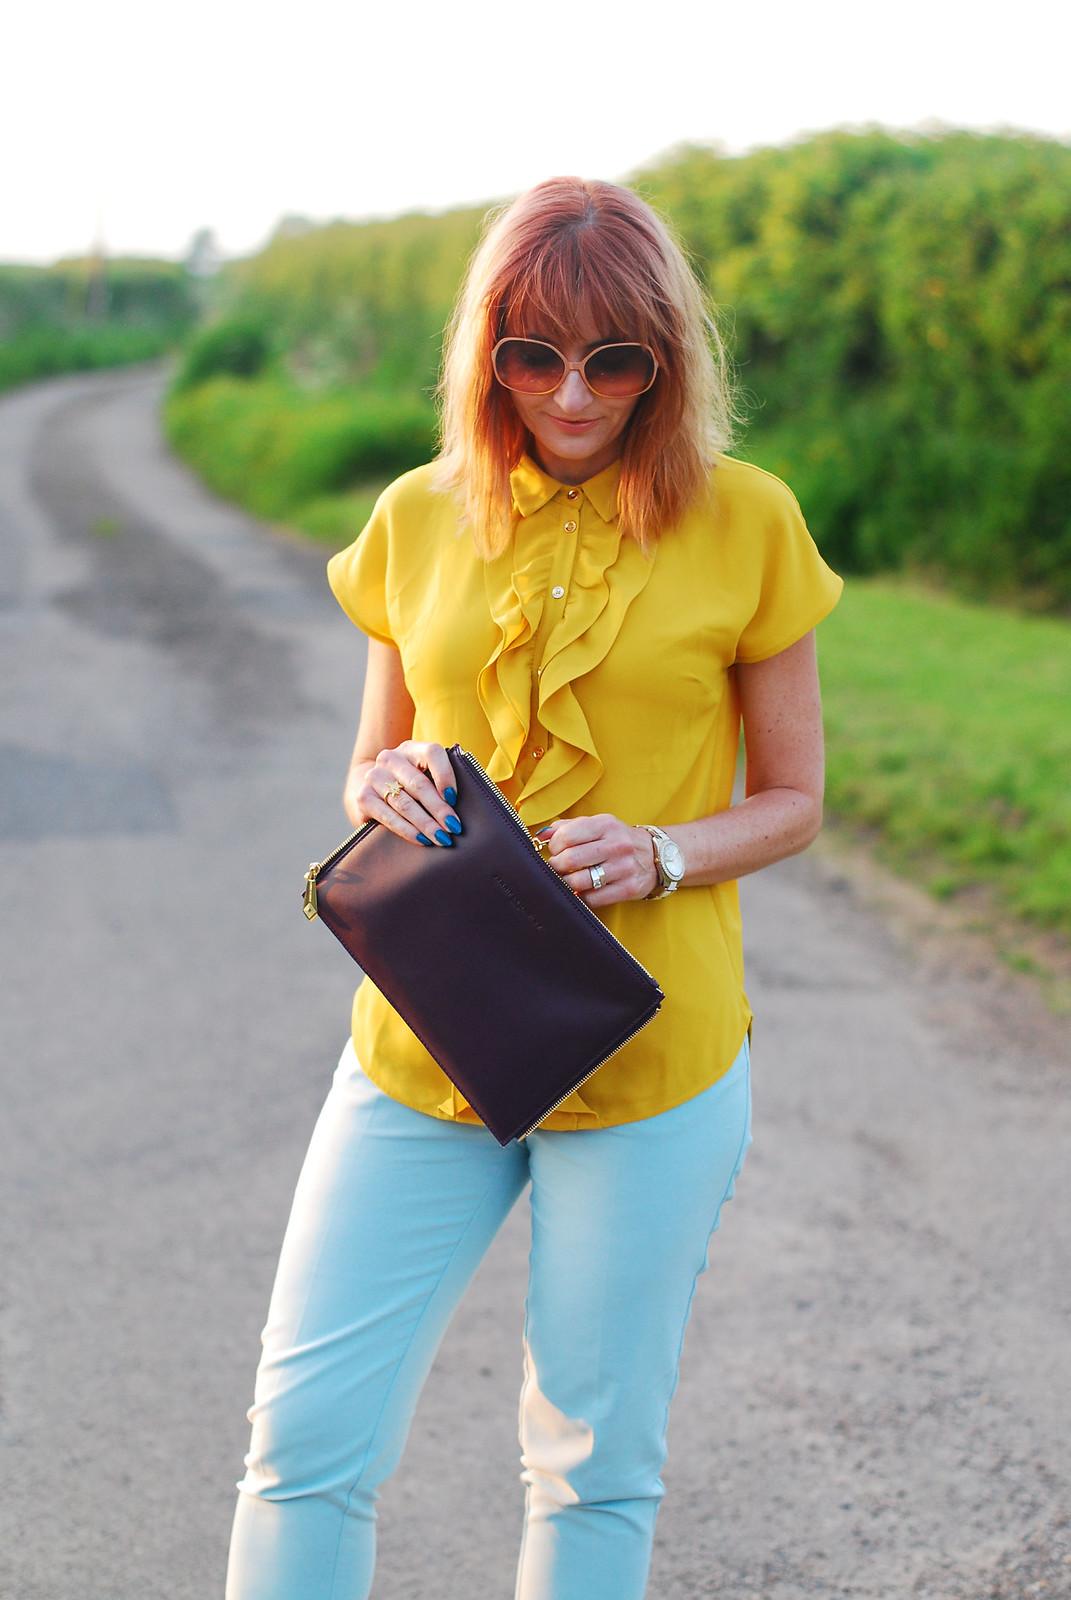 Summer brights: Ruffled yellow blouse, mint trousers, Jennifer Hamley Model KT Workbag clutch, oversized 70s sunglasses | Not Dressed As Lamb